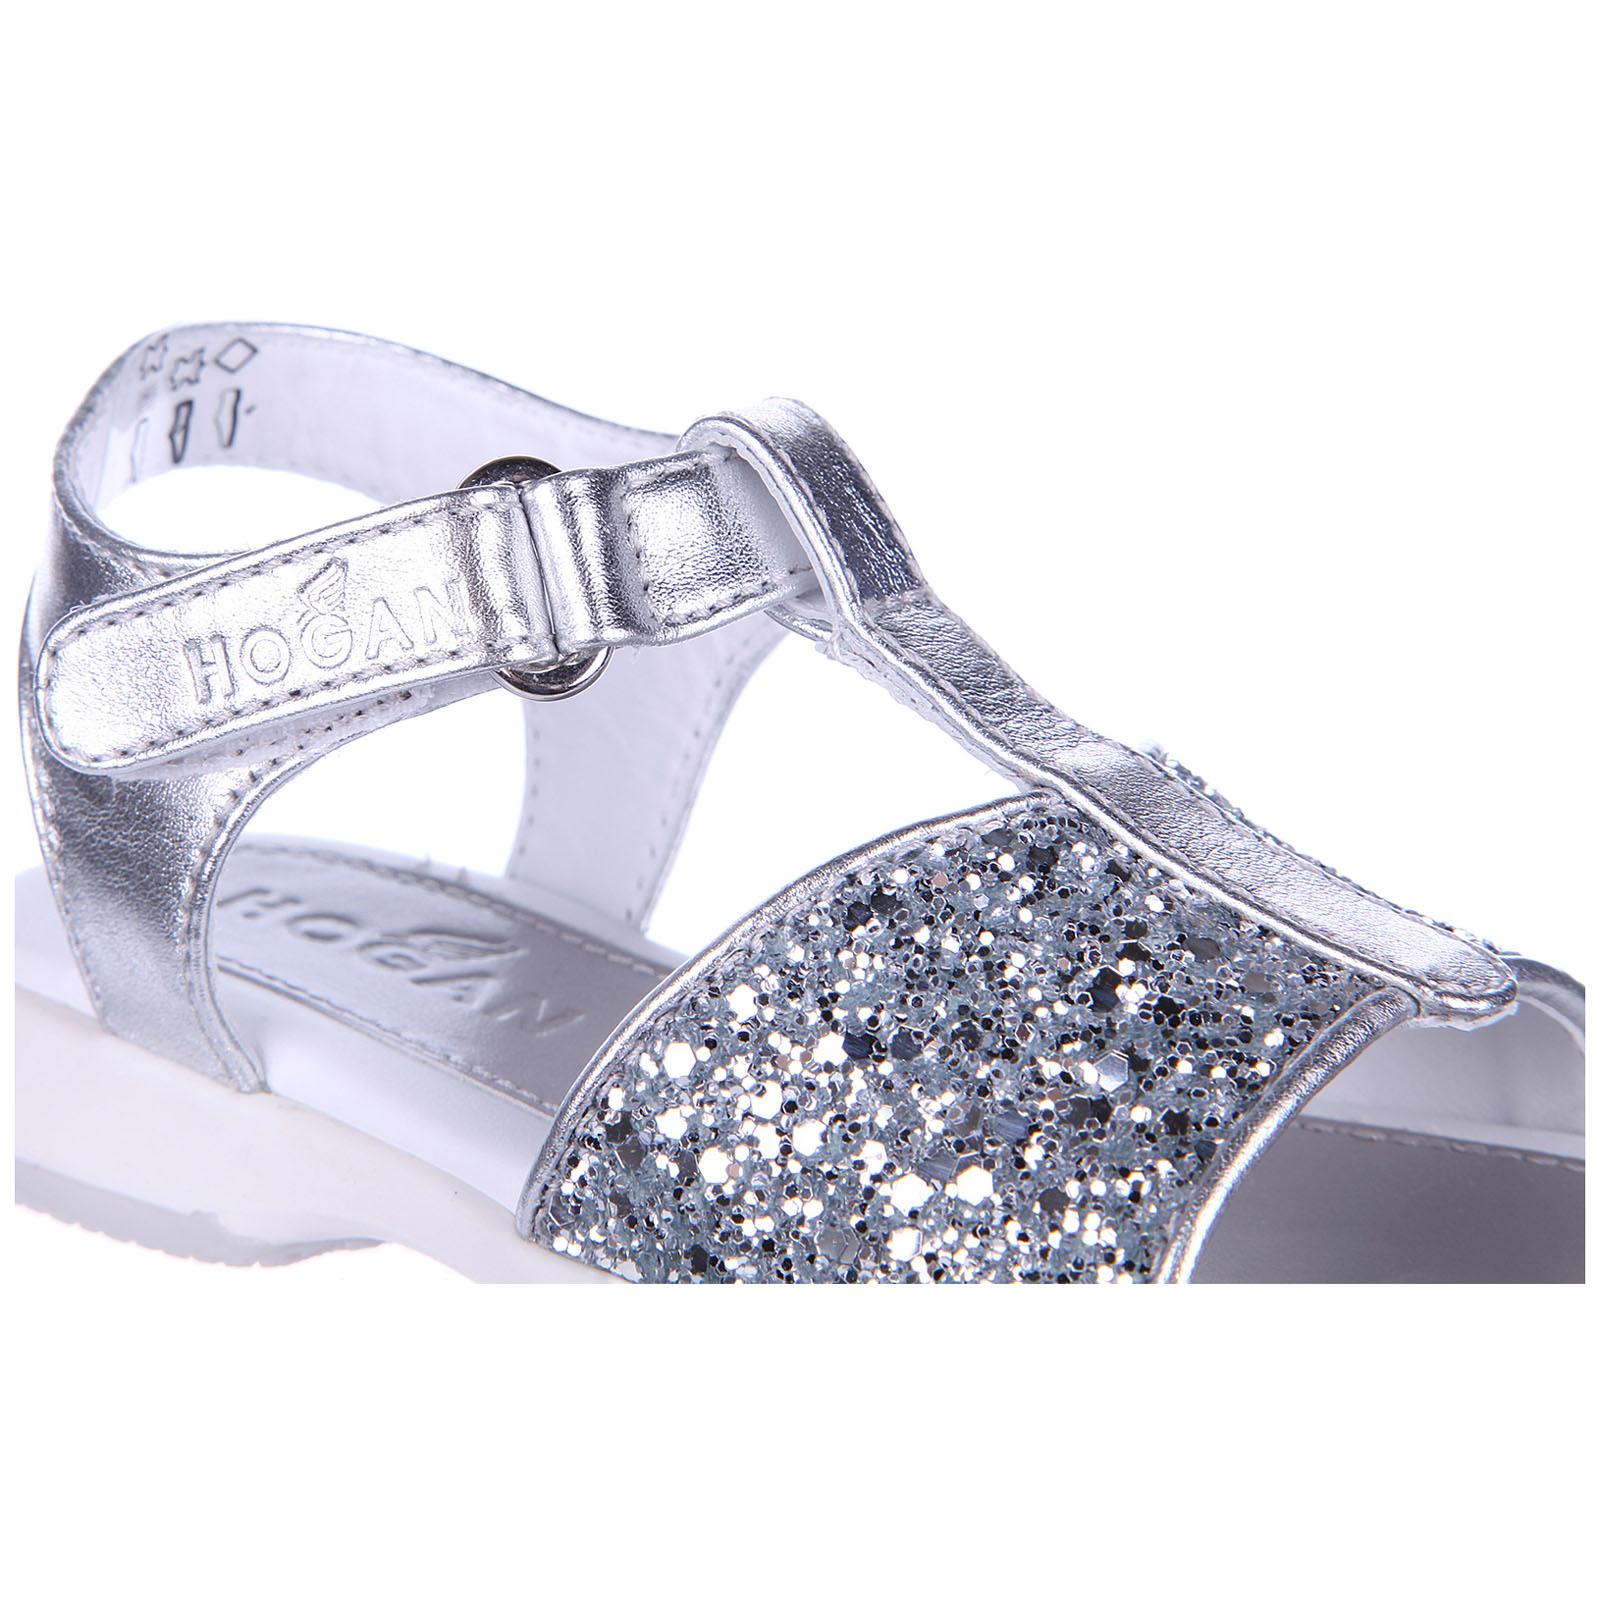 Sandales filles en cuir enfant j093 glitter Hogan t8Gq8